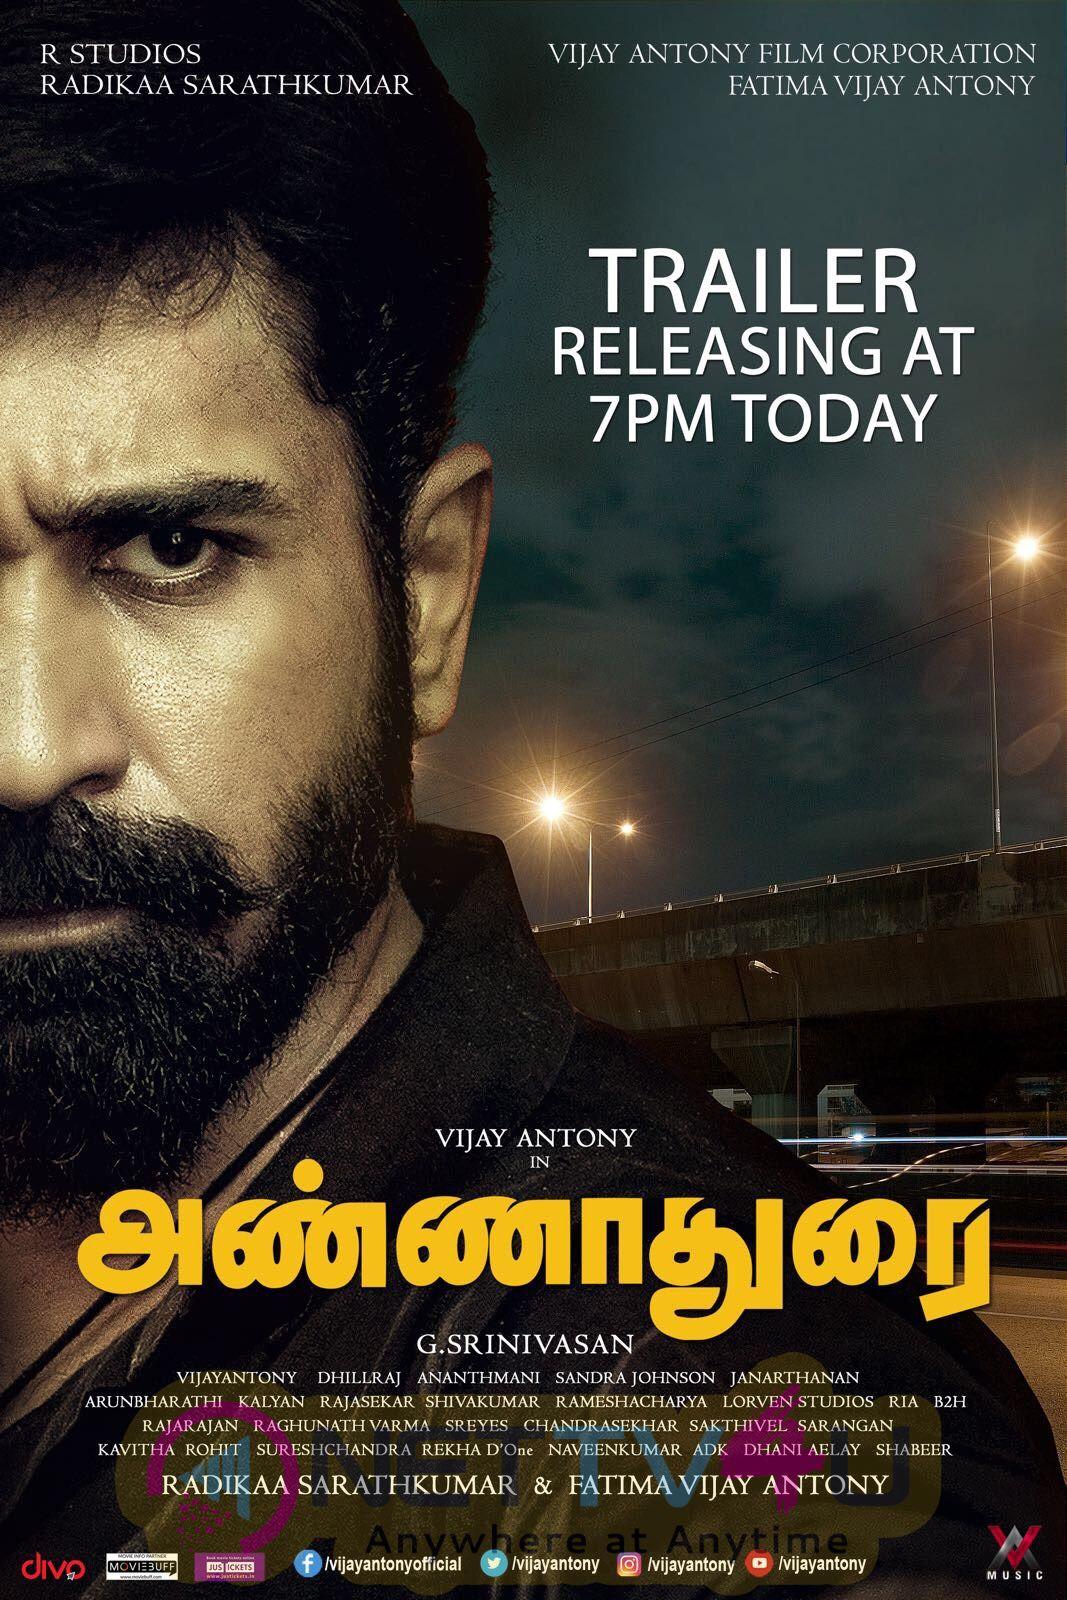 Annadurai Movie Trailer Releasing Poster